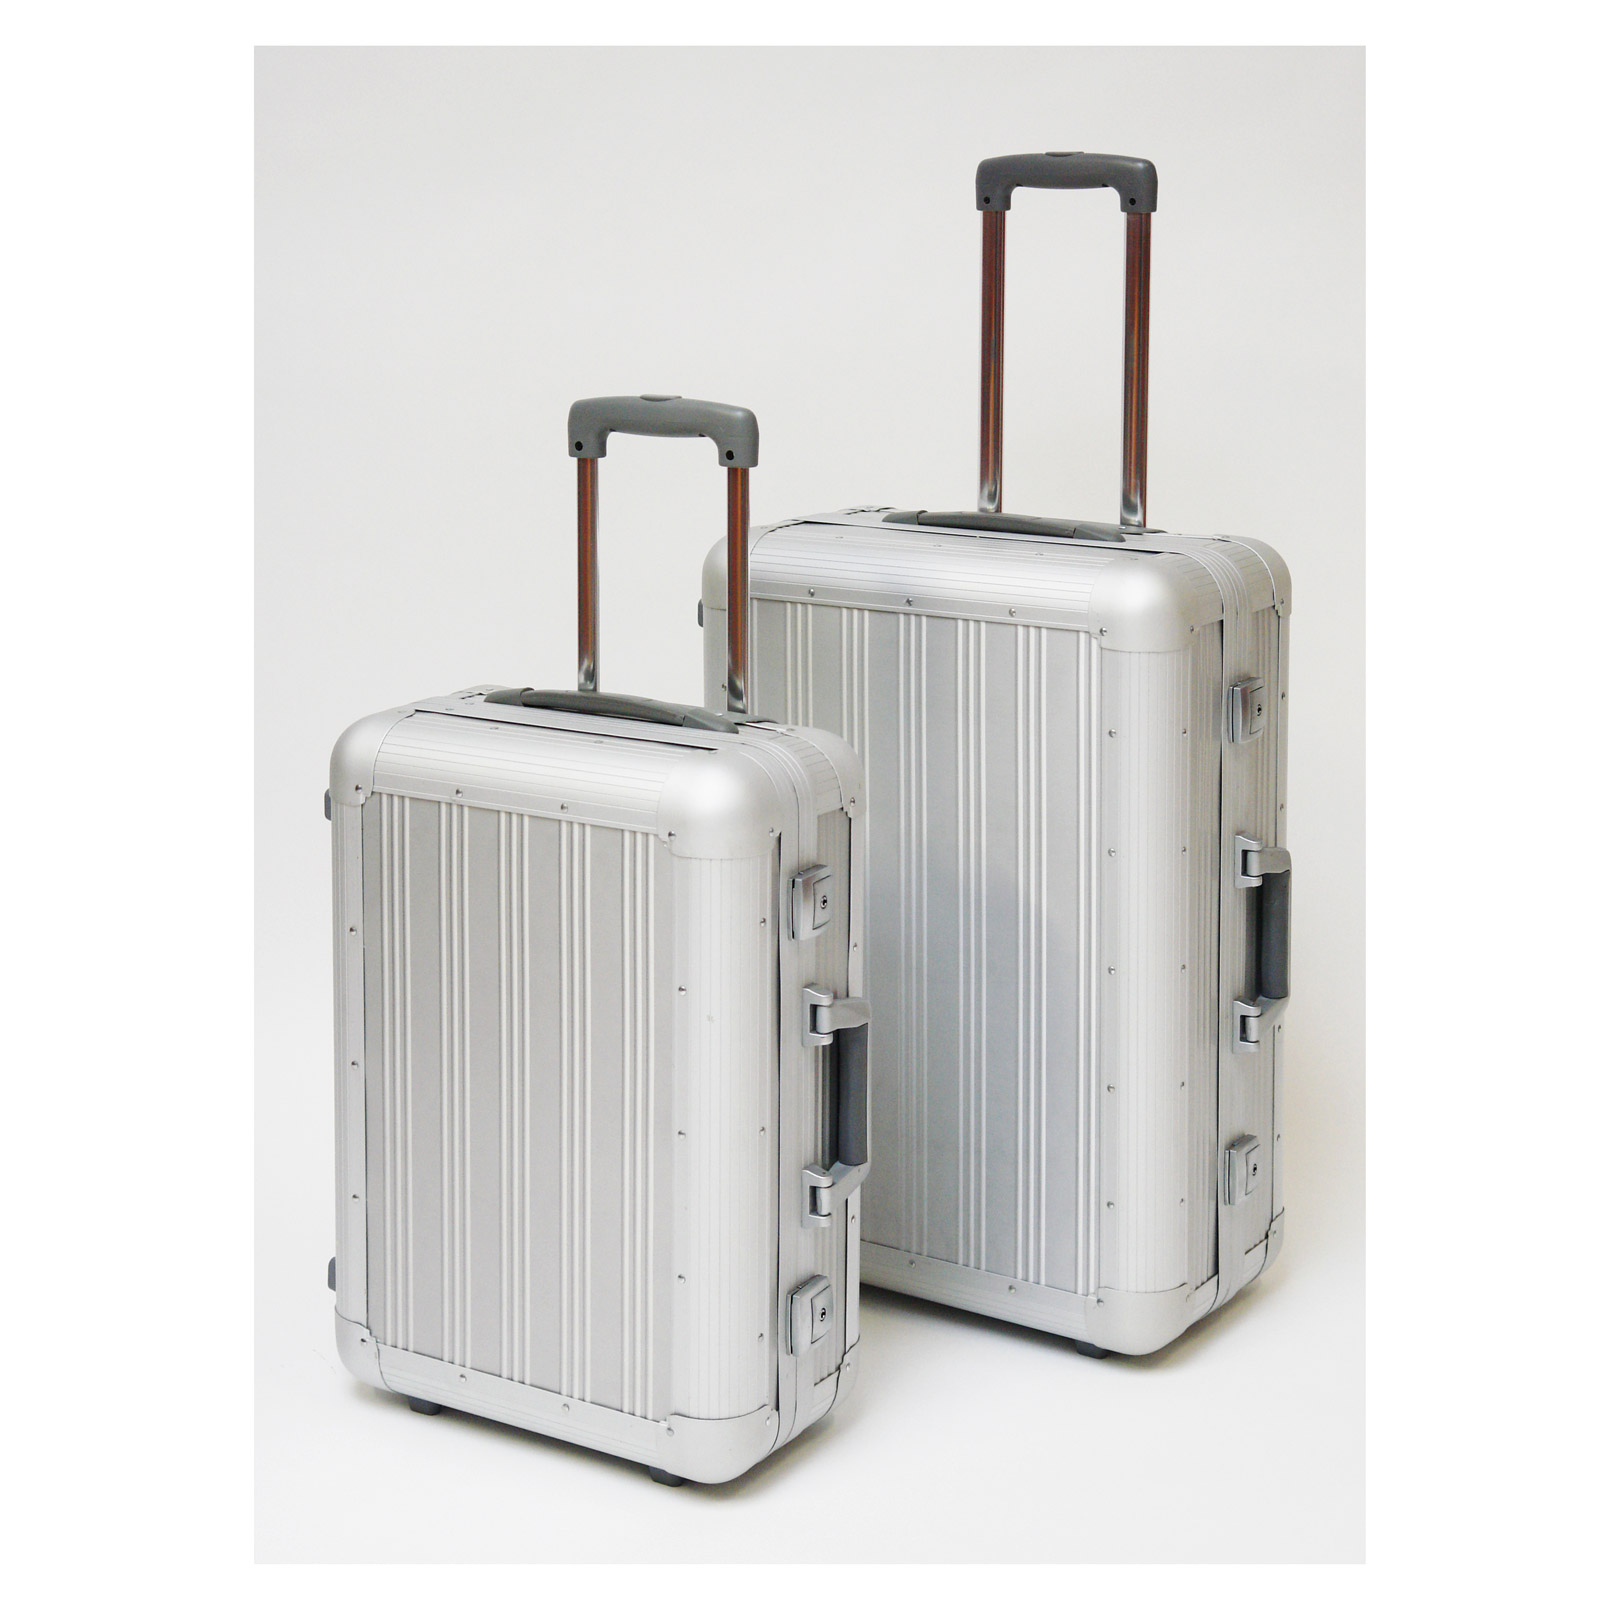 alu koffer trolley set 2 in 1 pilotenkoffer koffer reise urlaub 916928 ebay. Black Bedroom Furniture Sets. Home Design Ideas